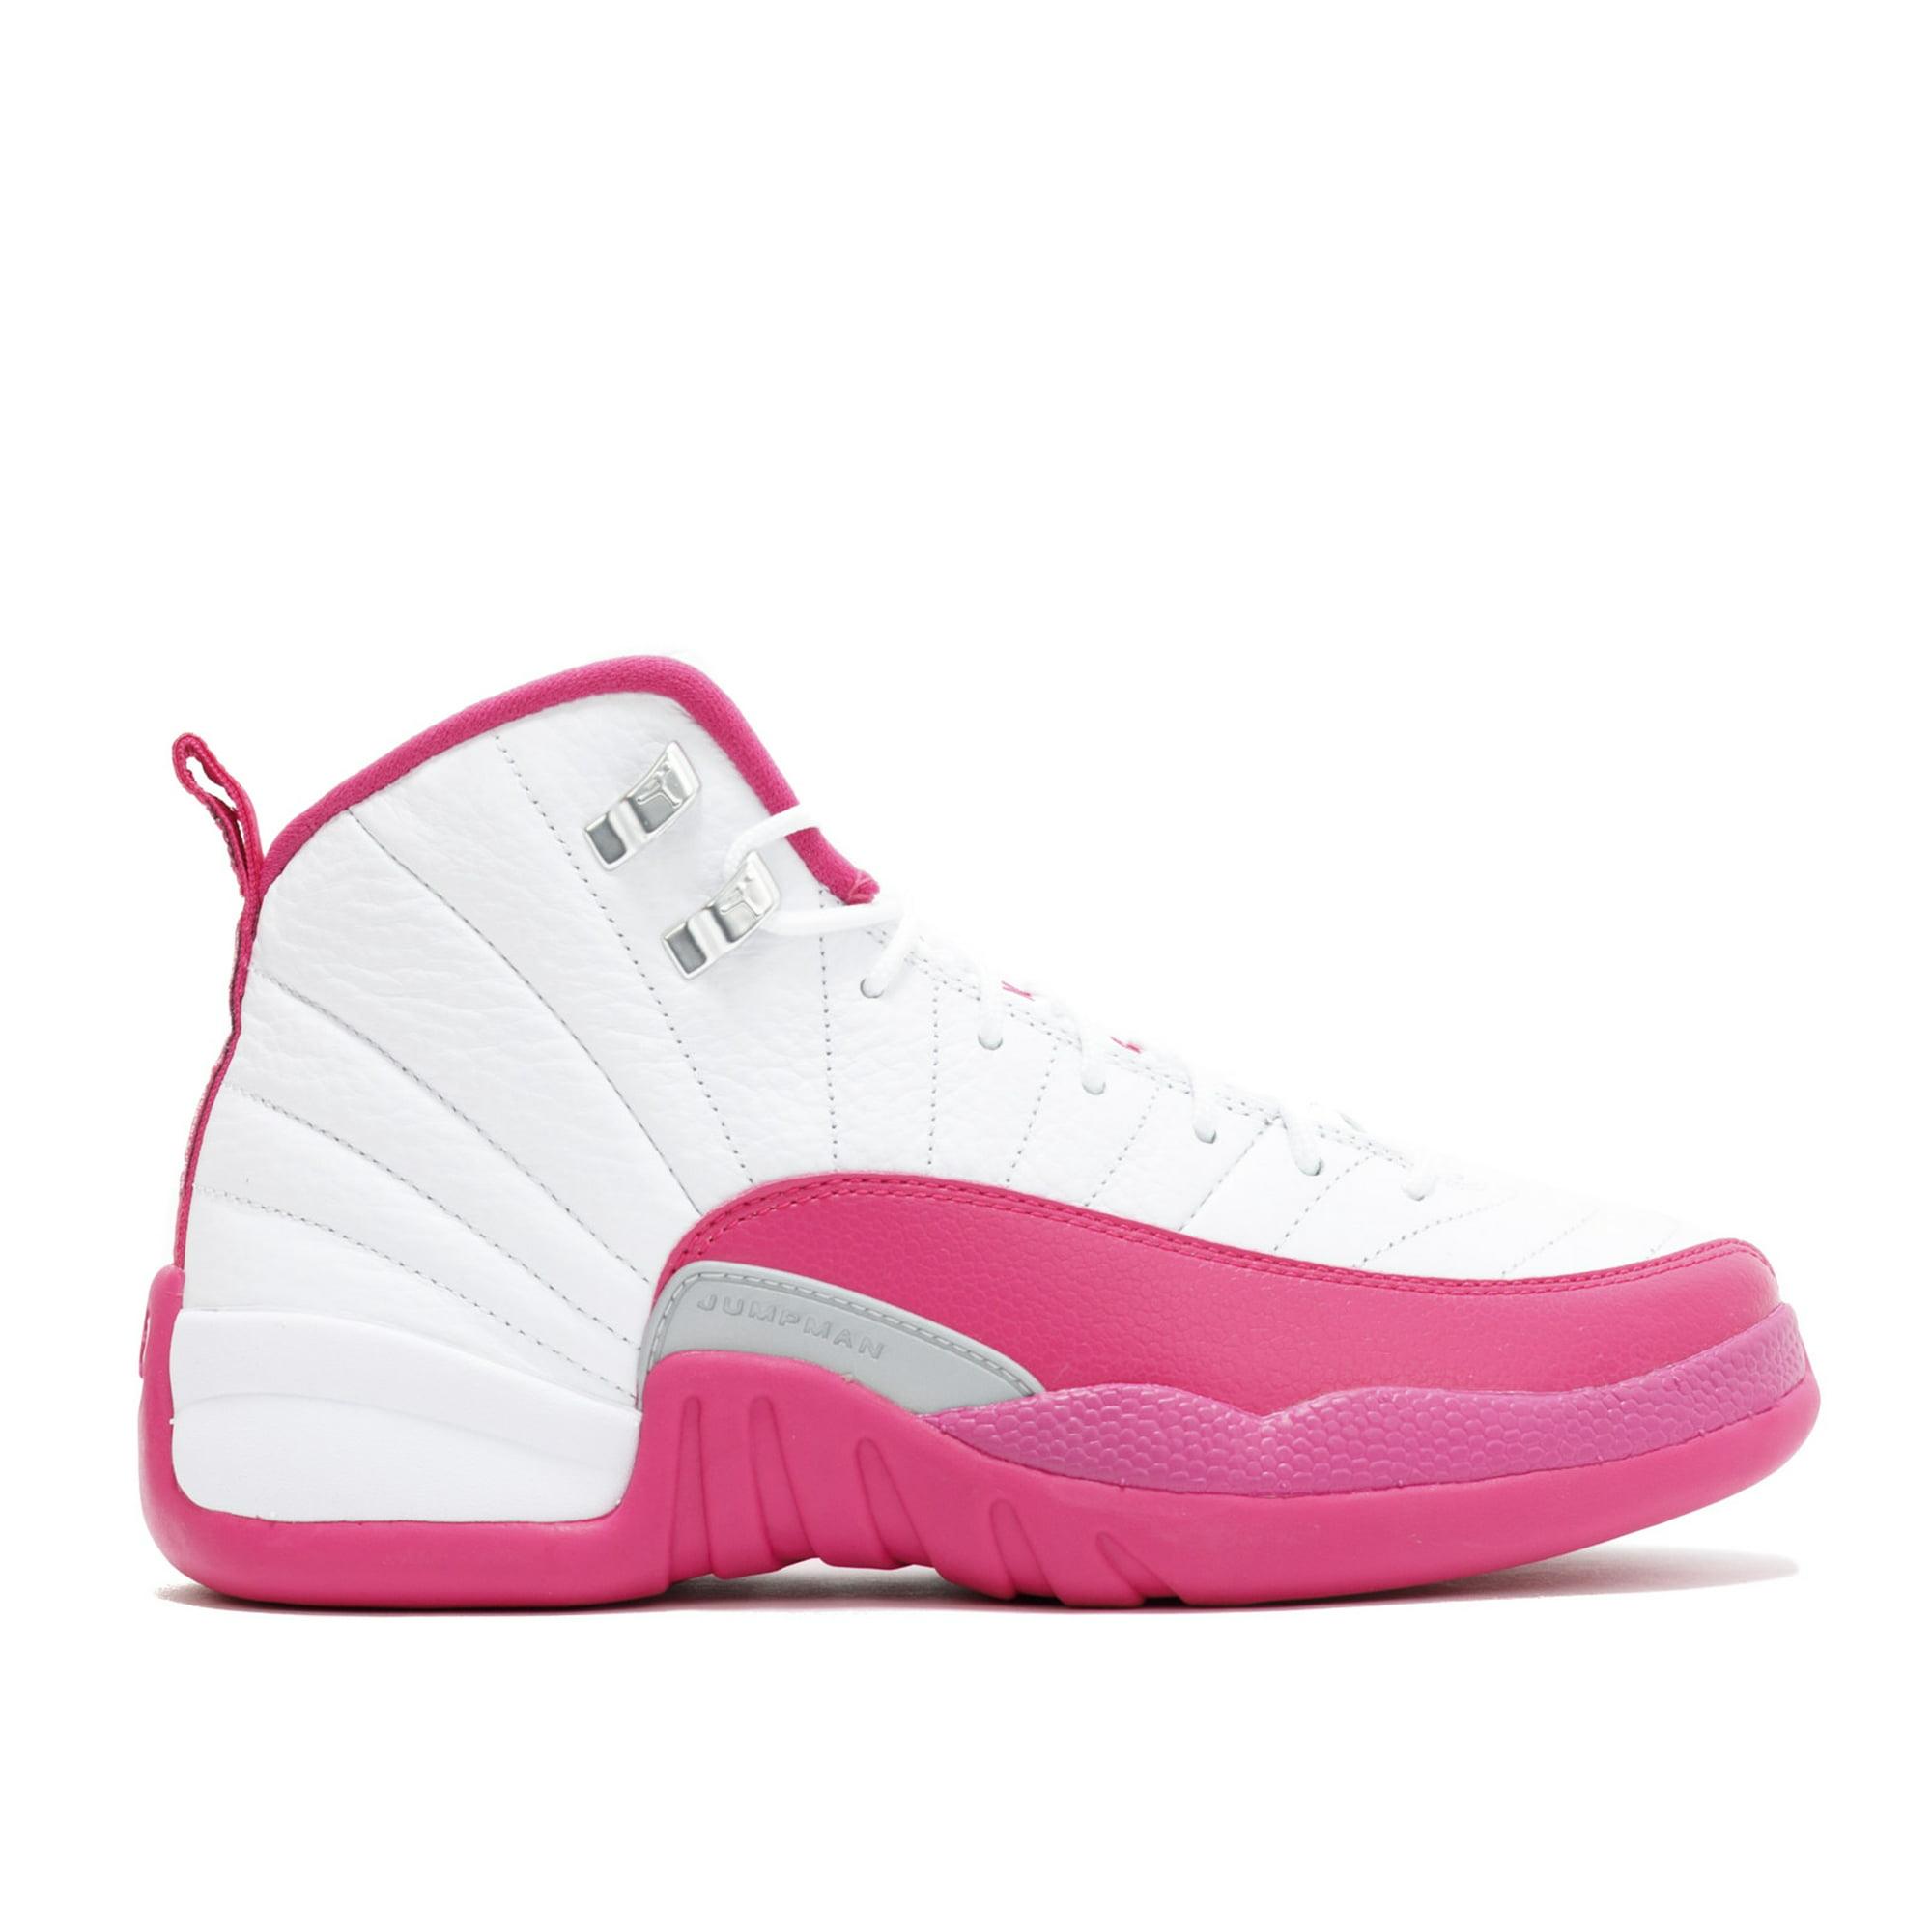 8750c94998f351 Air Jordan - Unisex - Air Jordan 12 Retro Gg (Gs)  Valentine s Day  - 510815-109  - Size 6.5